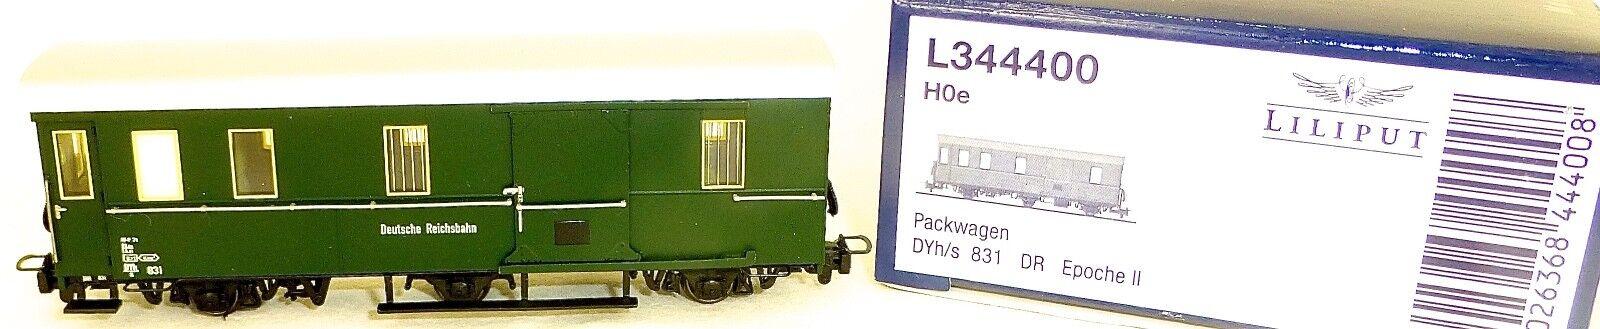 fur de equipaje equipaje equipaje dyh / S 831 DR EPII Liliput l344400 H0e 1:87 emb.orig vía 9e343a